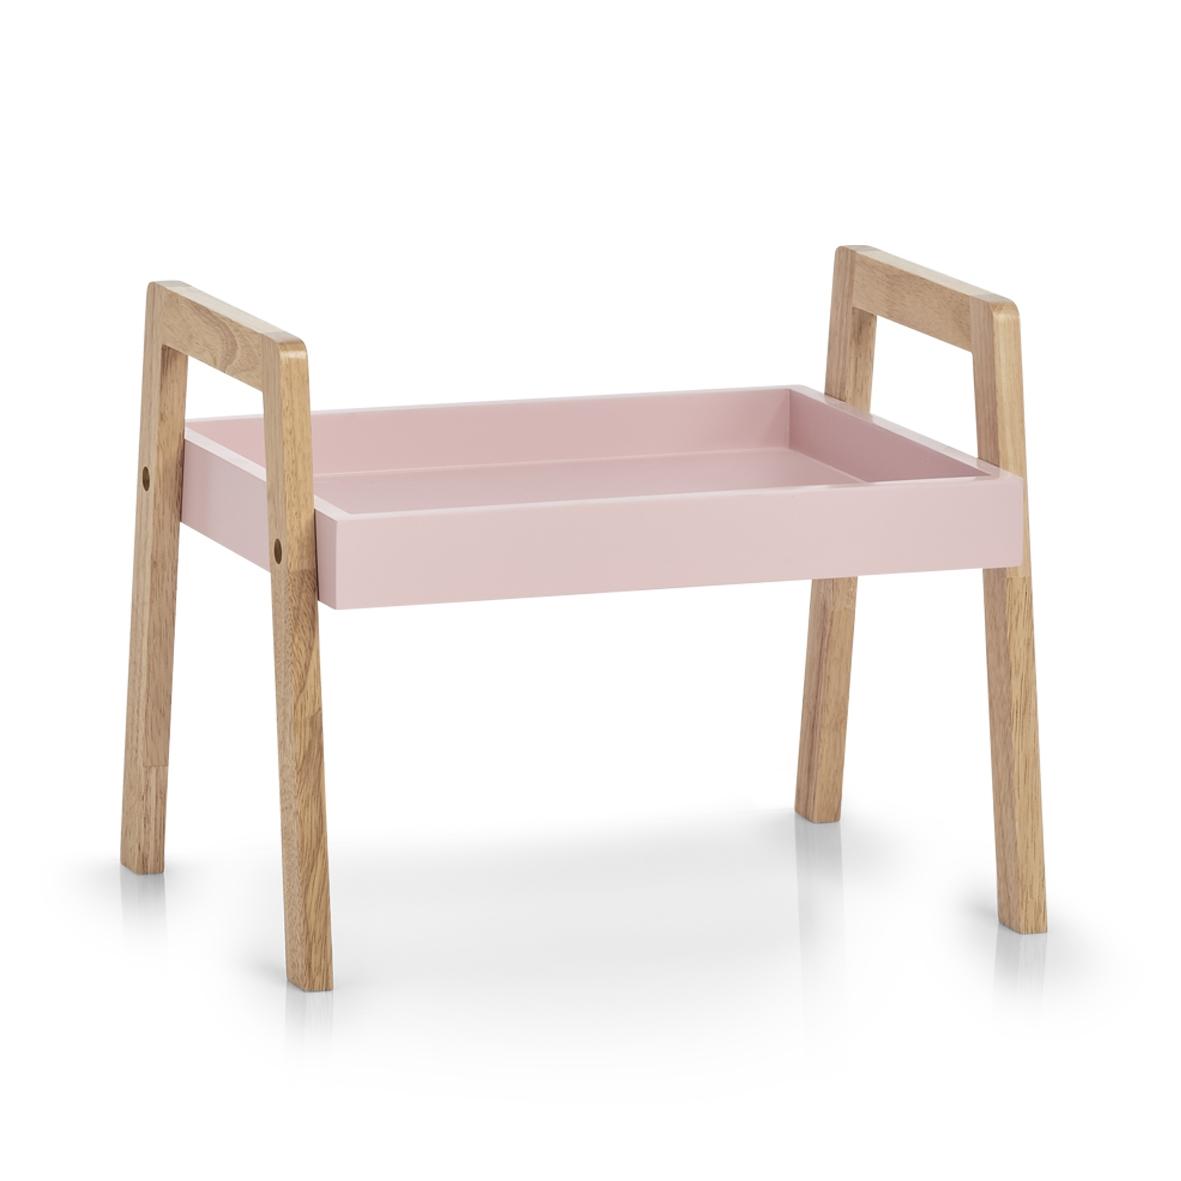 Masuta servire pat, din MDF si lemn Wood Roz / Natural, L40xl30,5xH32,5 cm imagine